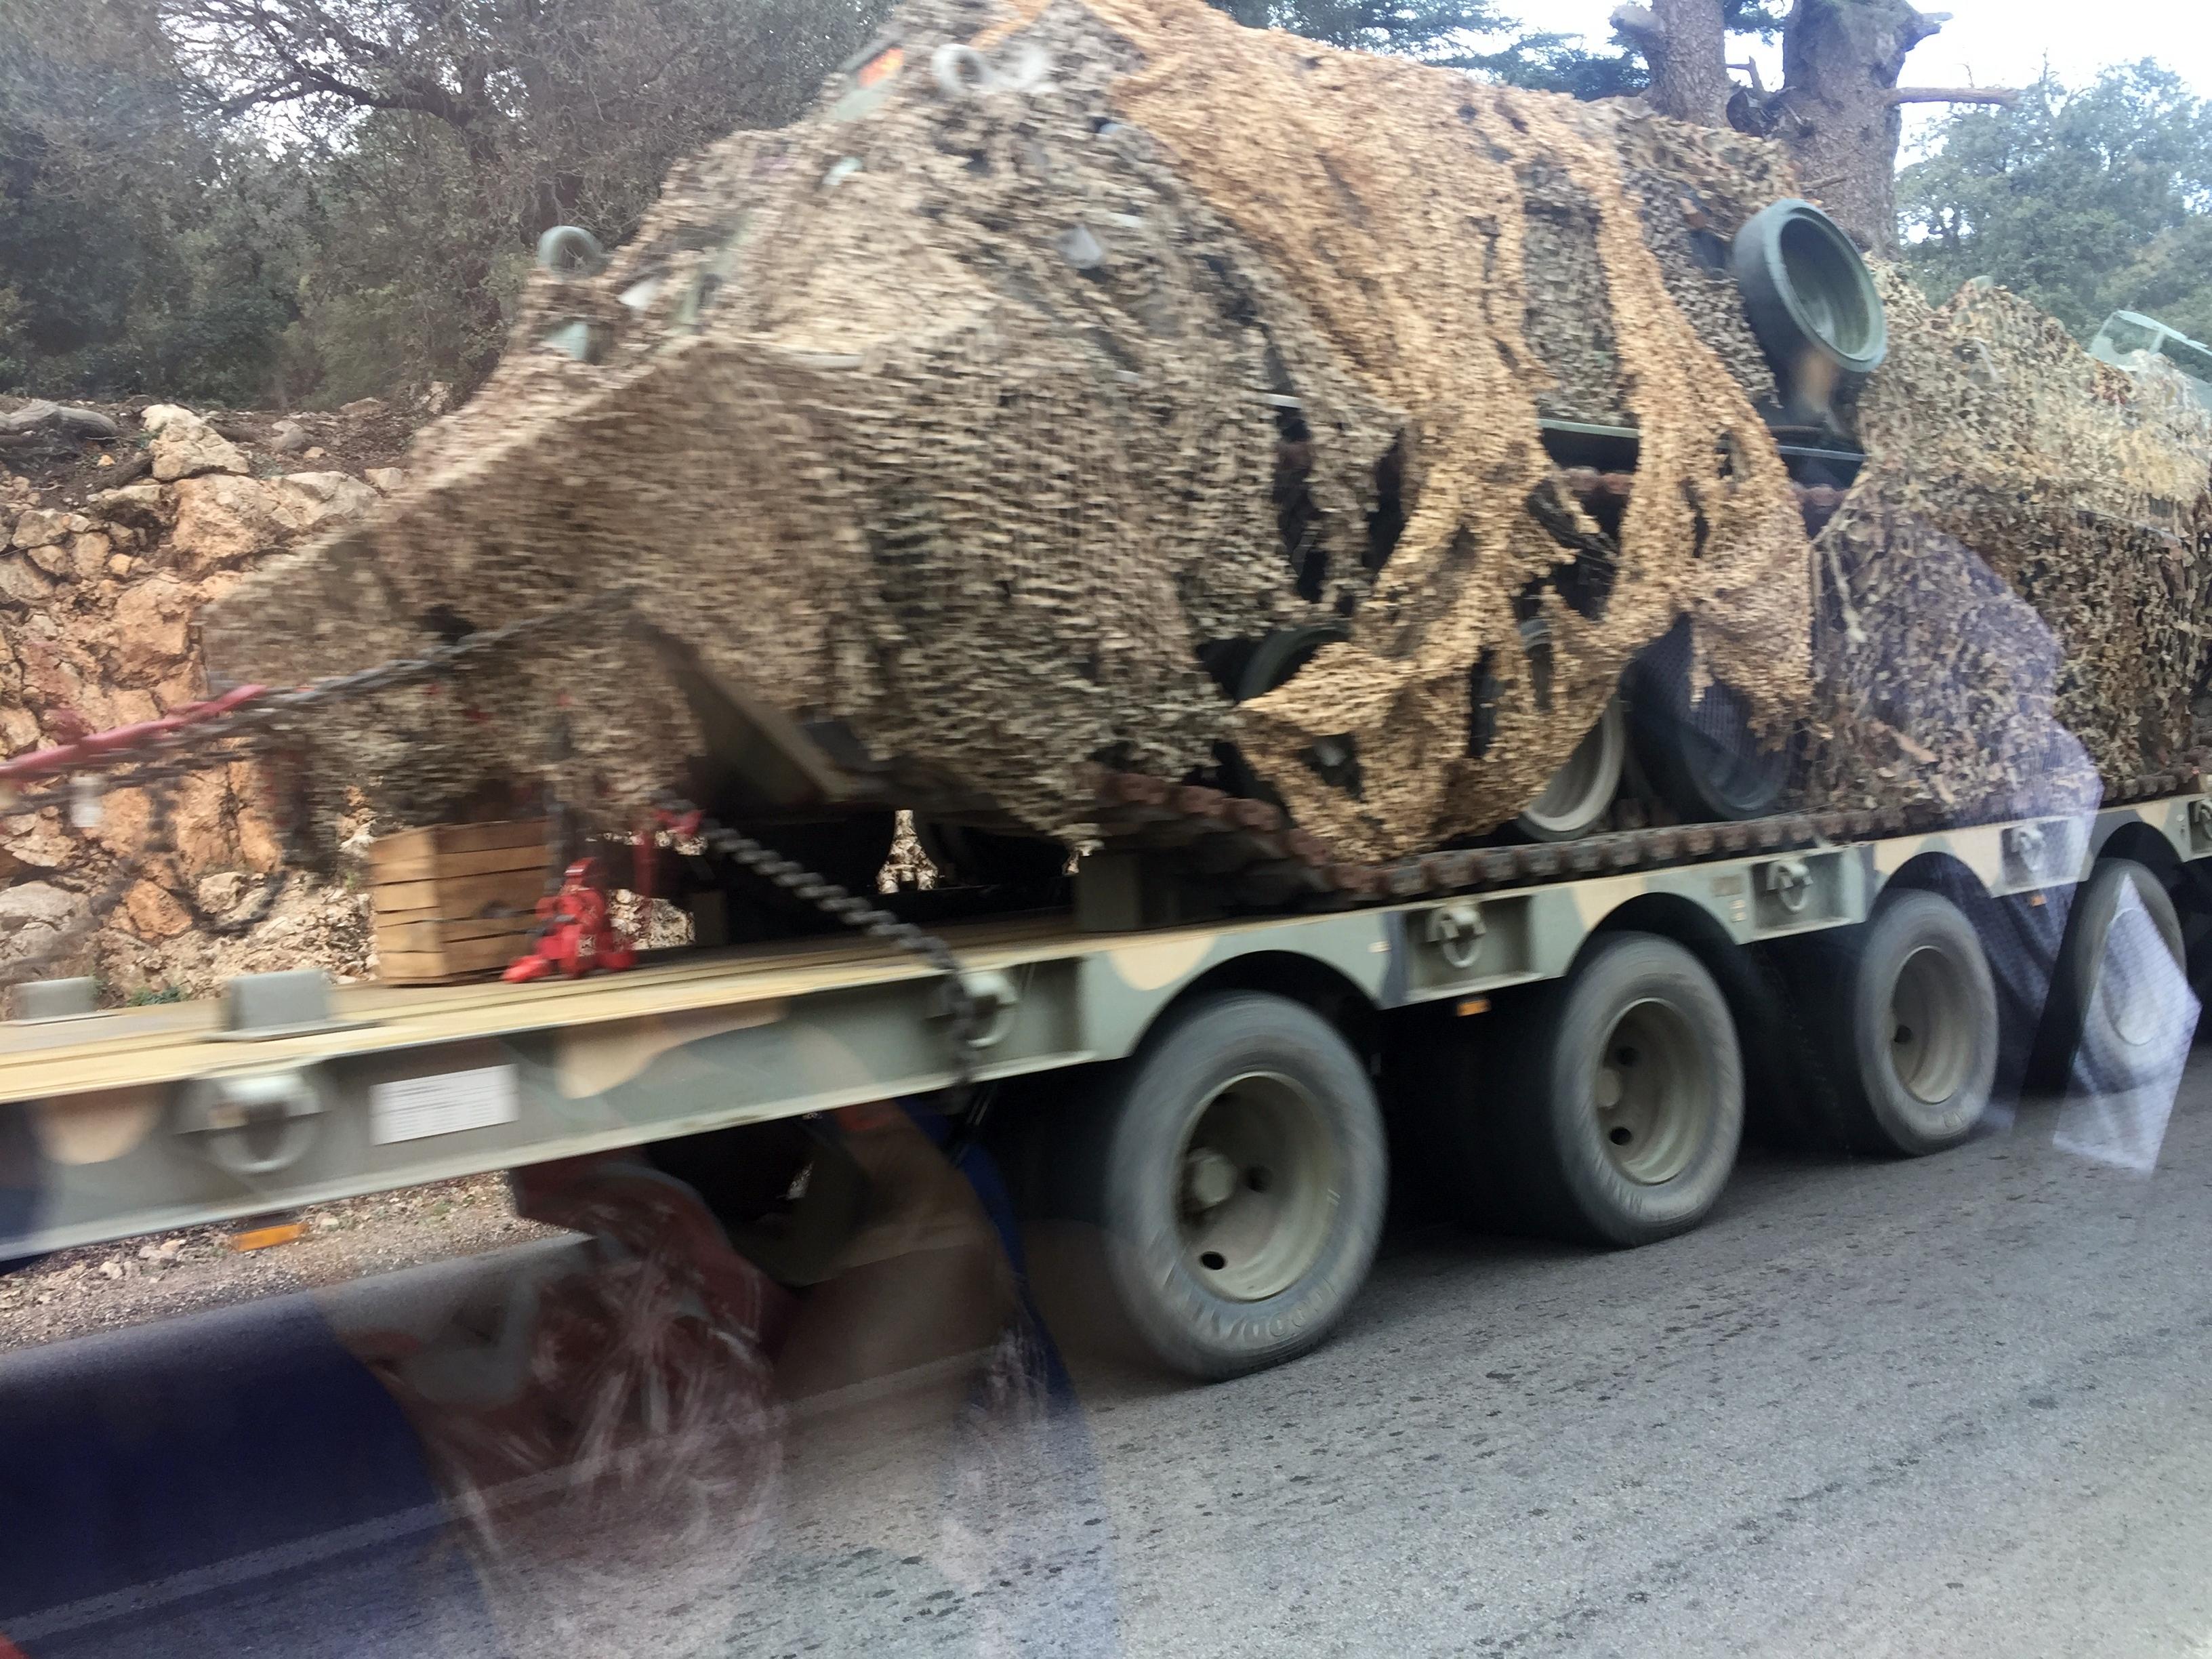 Photos - Logistique et Camions / Logistics and Trucks - Page 6 38535418006_138783904b_o